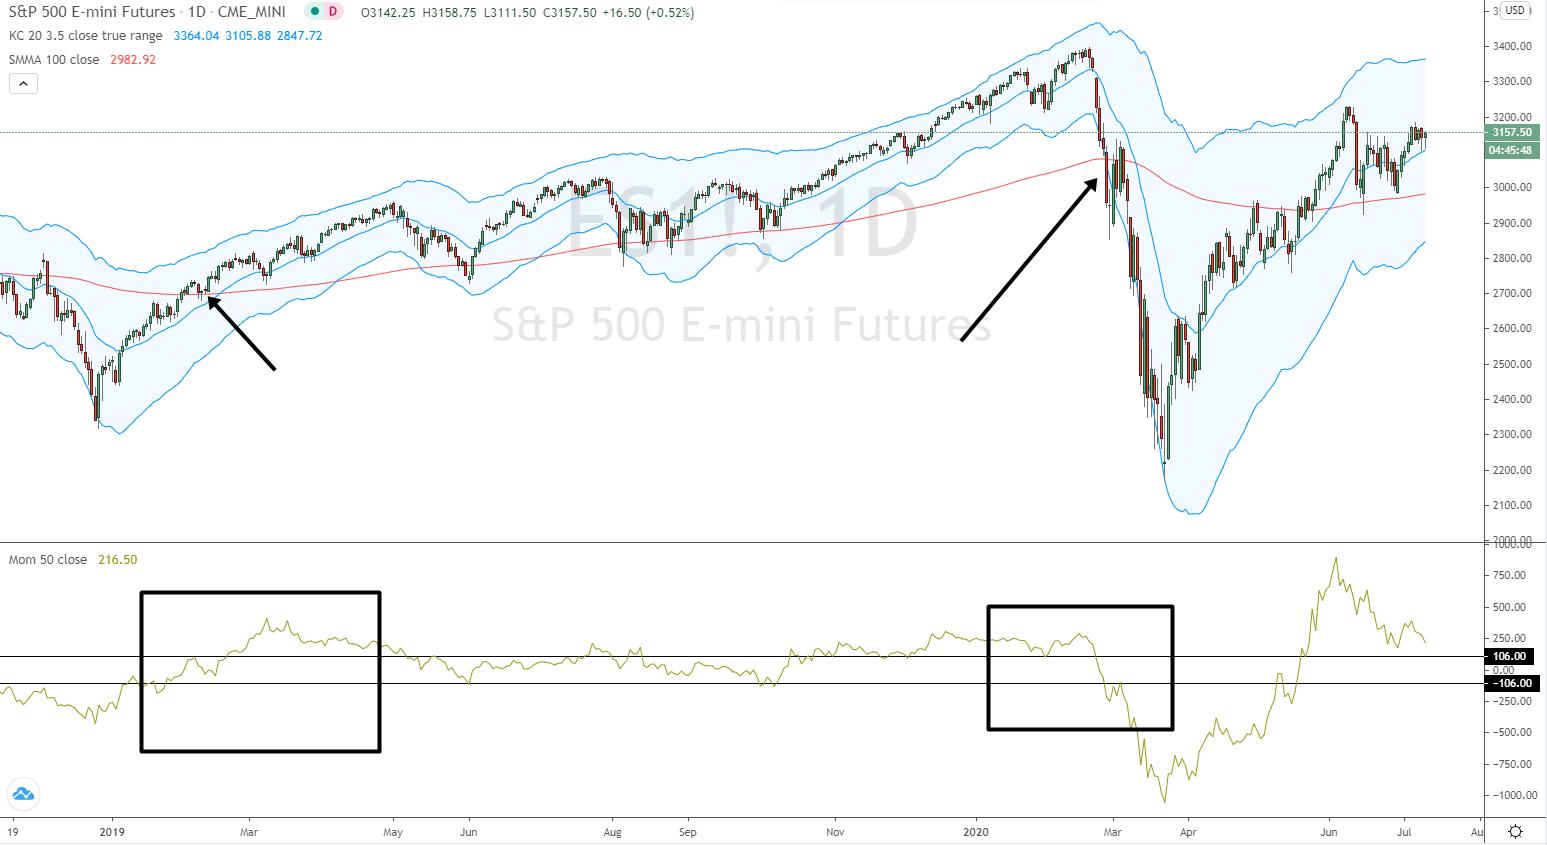 Momentum Trading Short Long